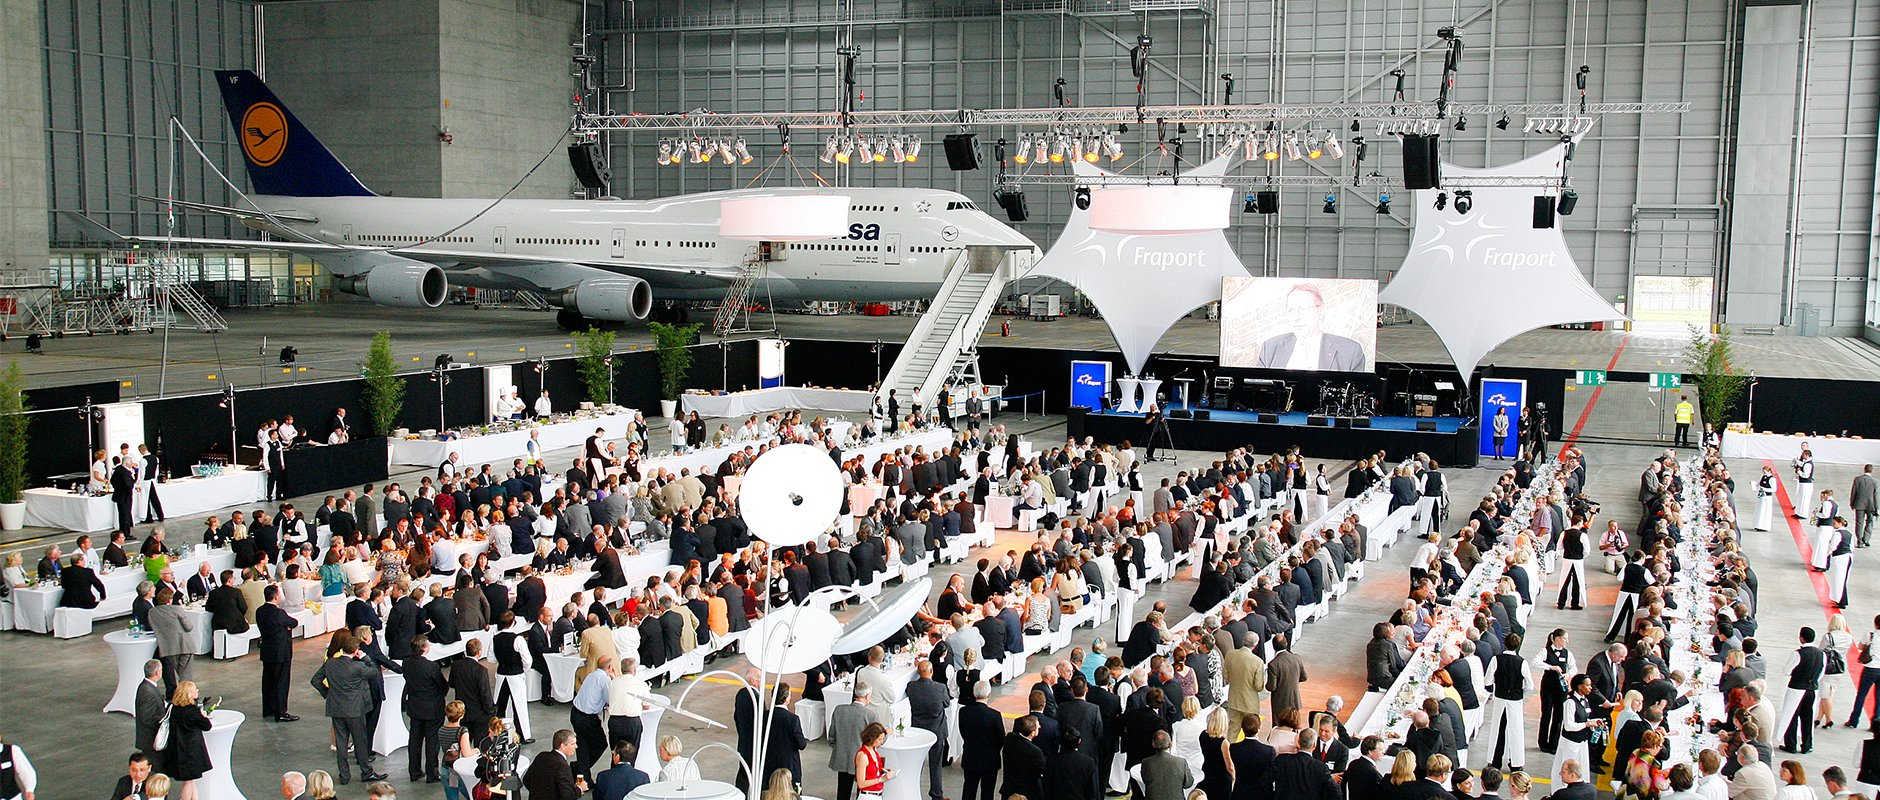 La alemana Fraport AG ganó 413,5 millones de euros hasta septiembre, un 9,4% más